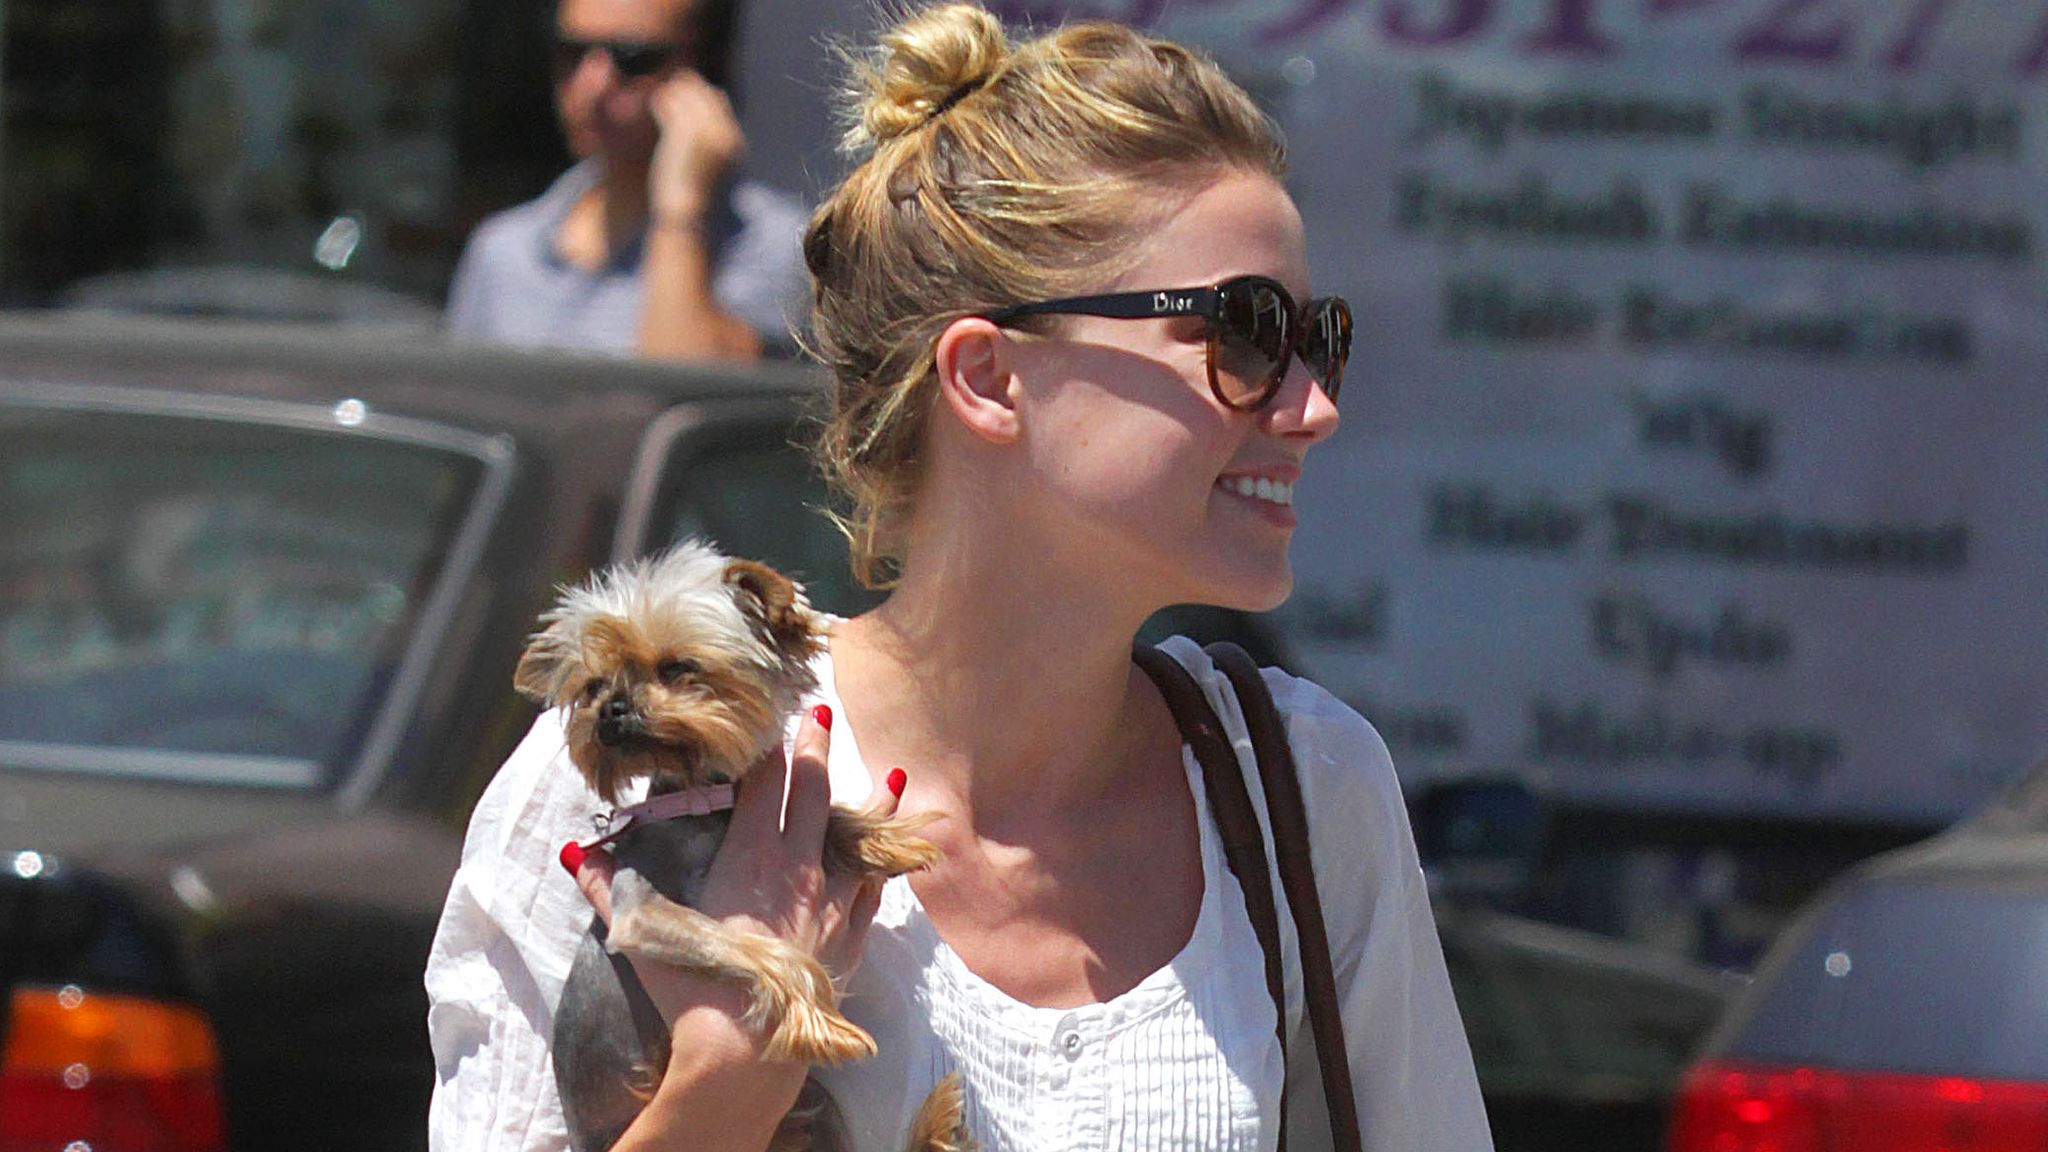 Amber Heard with her dog Pistol in 2010. Pic: Startraks/Shutterstock